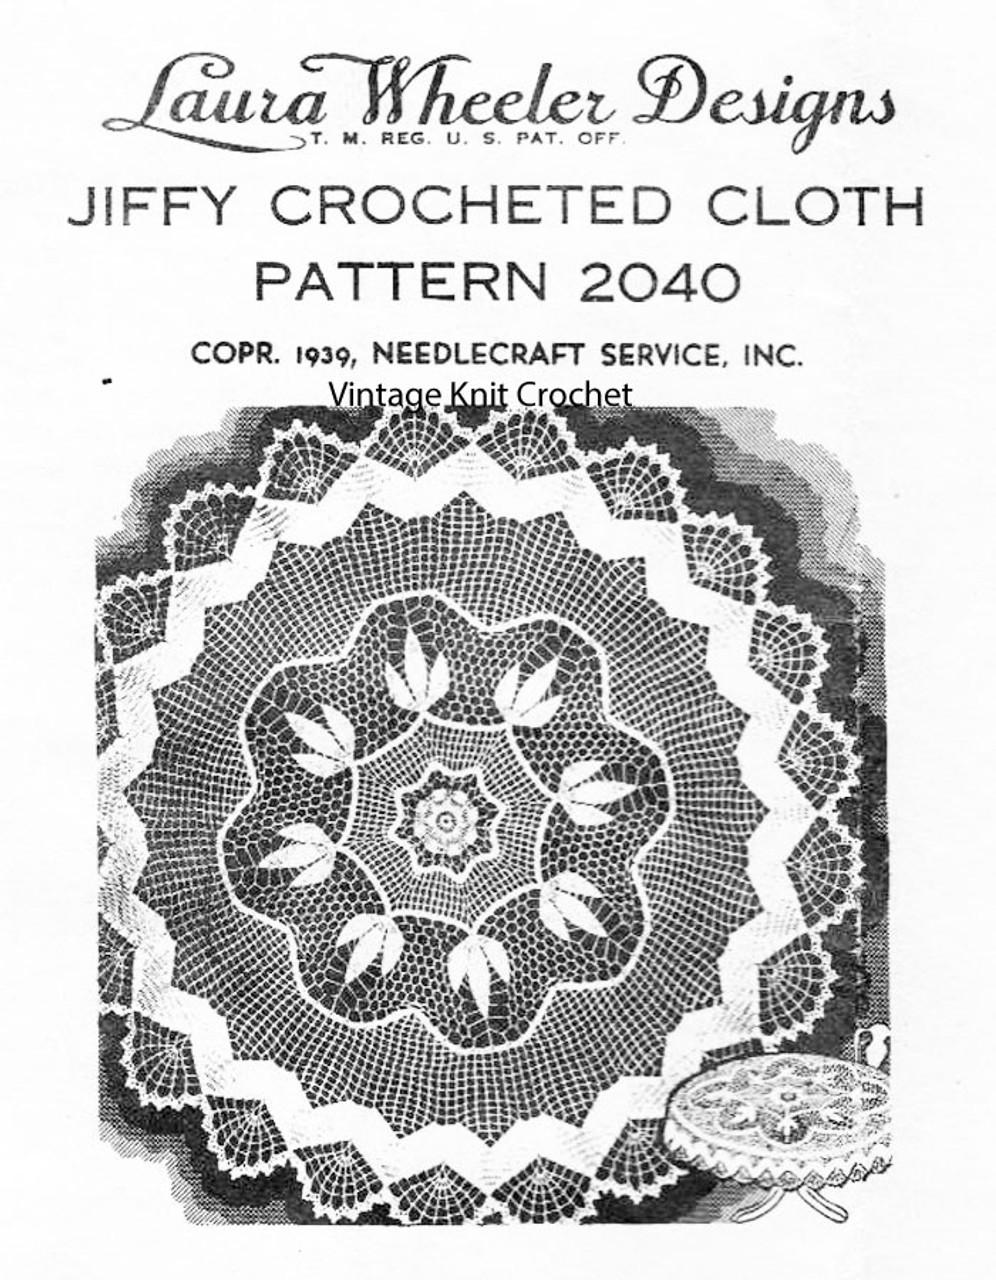 Vintage Round Crochet Tablecloth Pattern, Laura Wheeler 2040